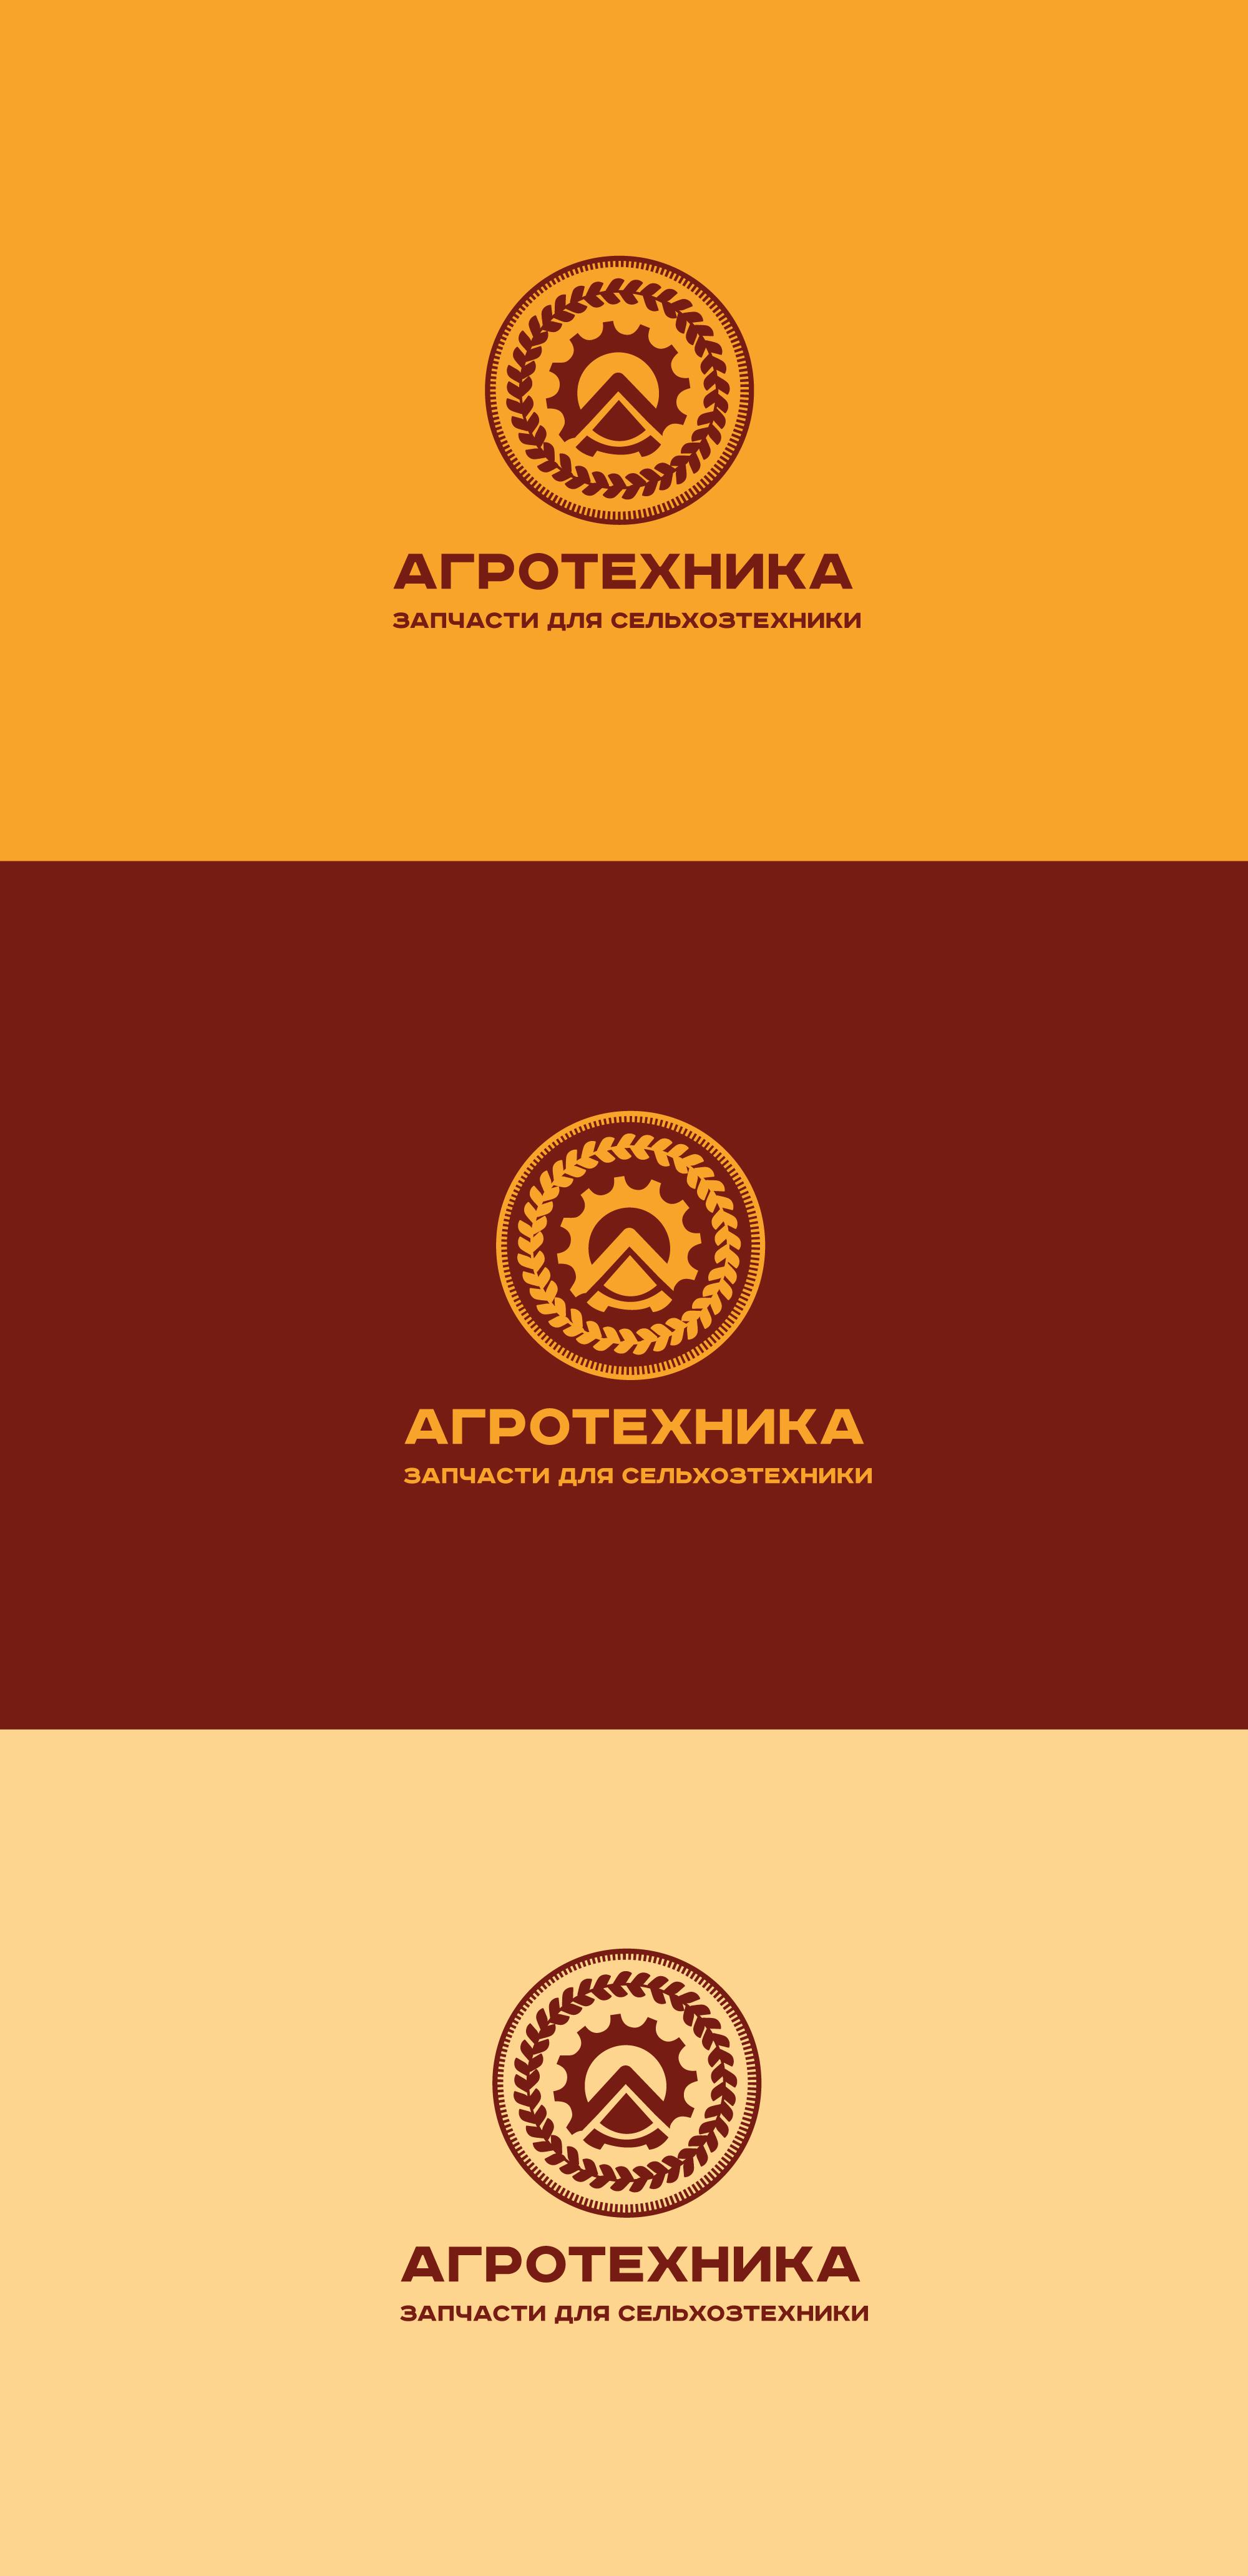 Разработка логотипа для компании Агротехника фото f_7395bfee2f2ad8c2.jpg